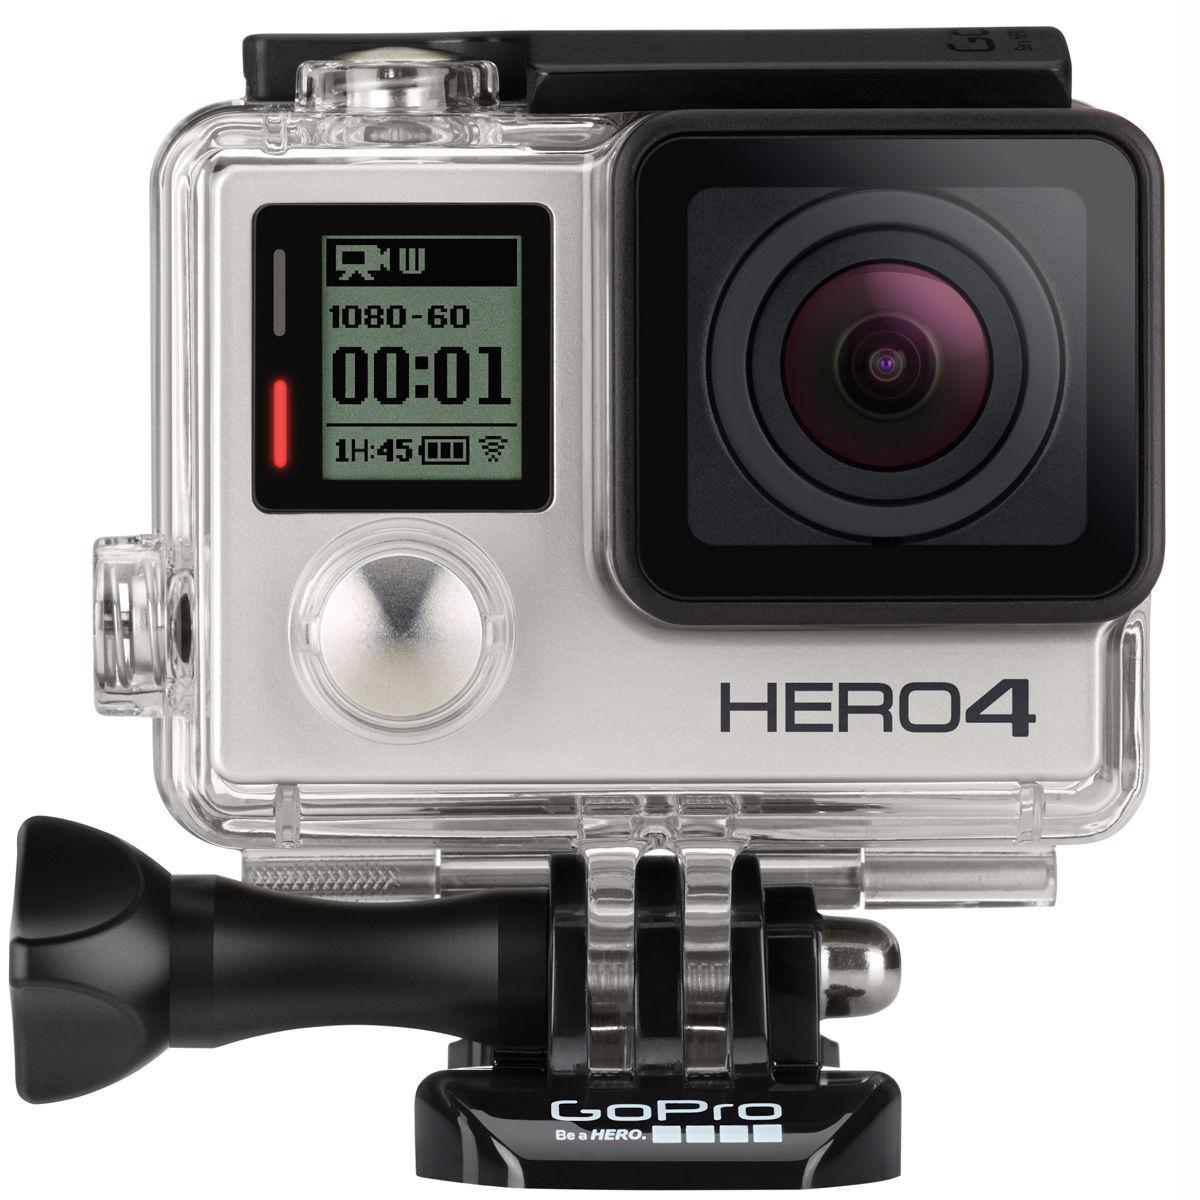 $244 GoPro HERO4 Silver Edition Camera Manufacturer Refurbished - Ebay Daily Deal